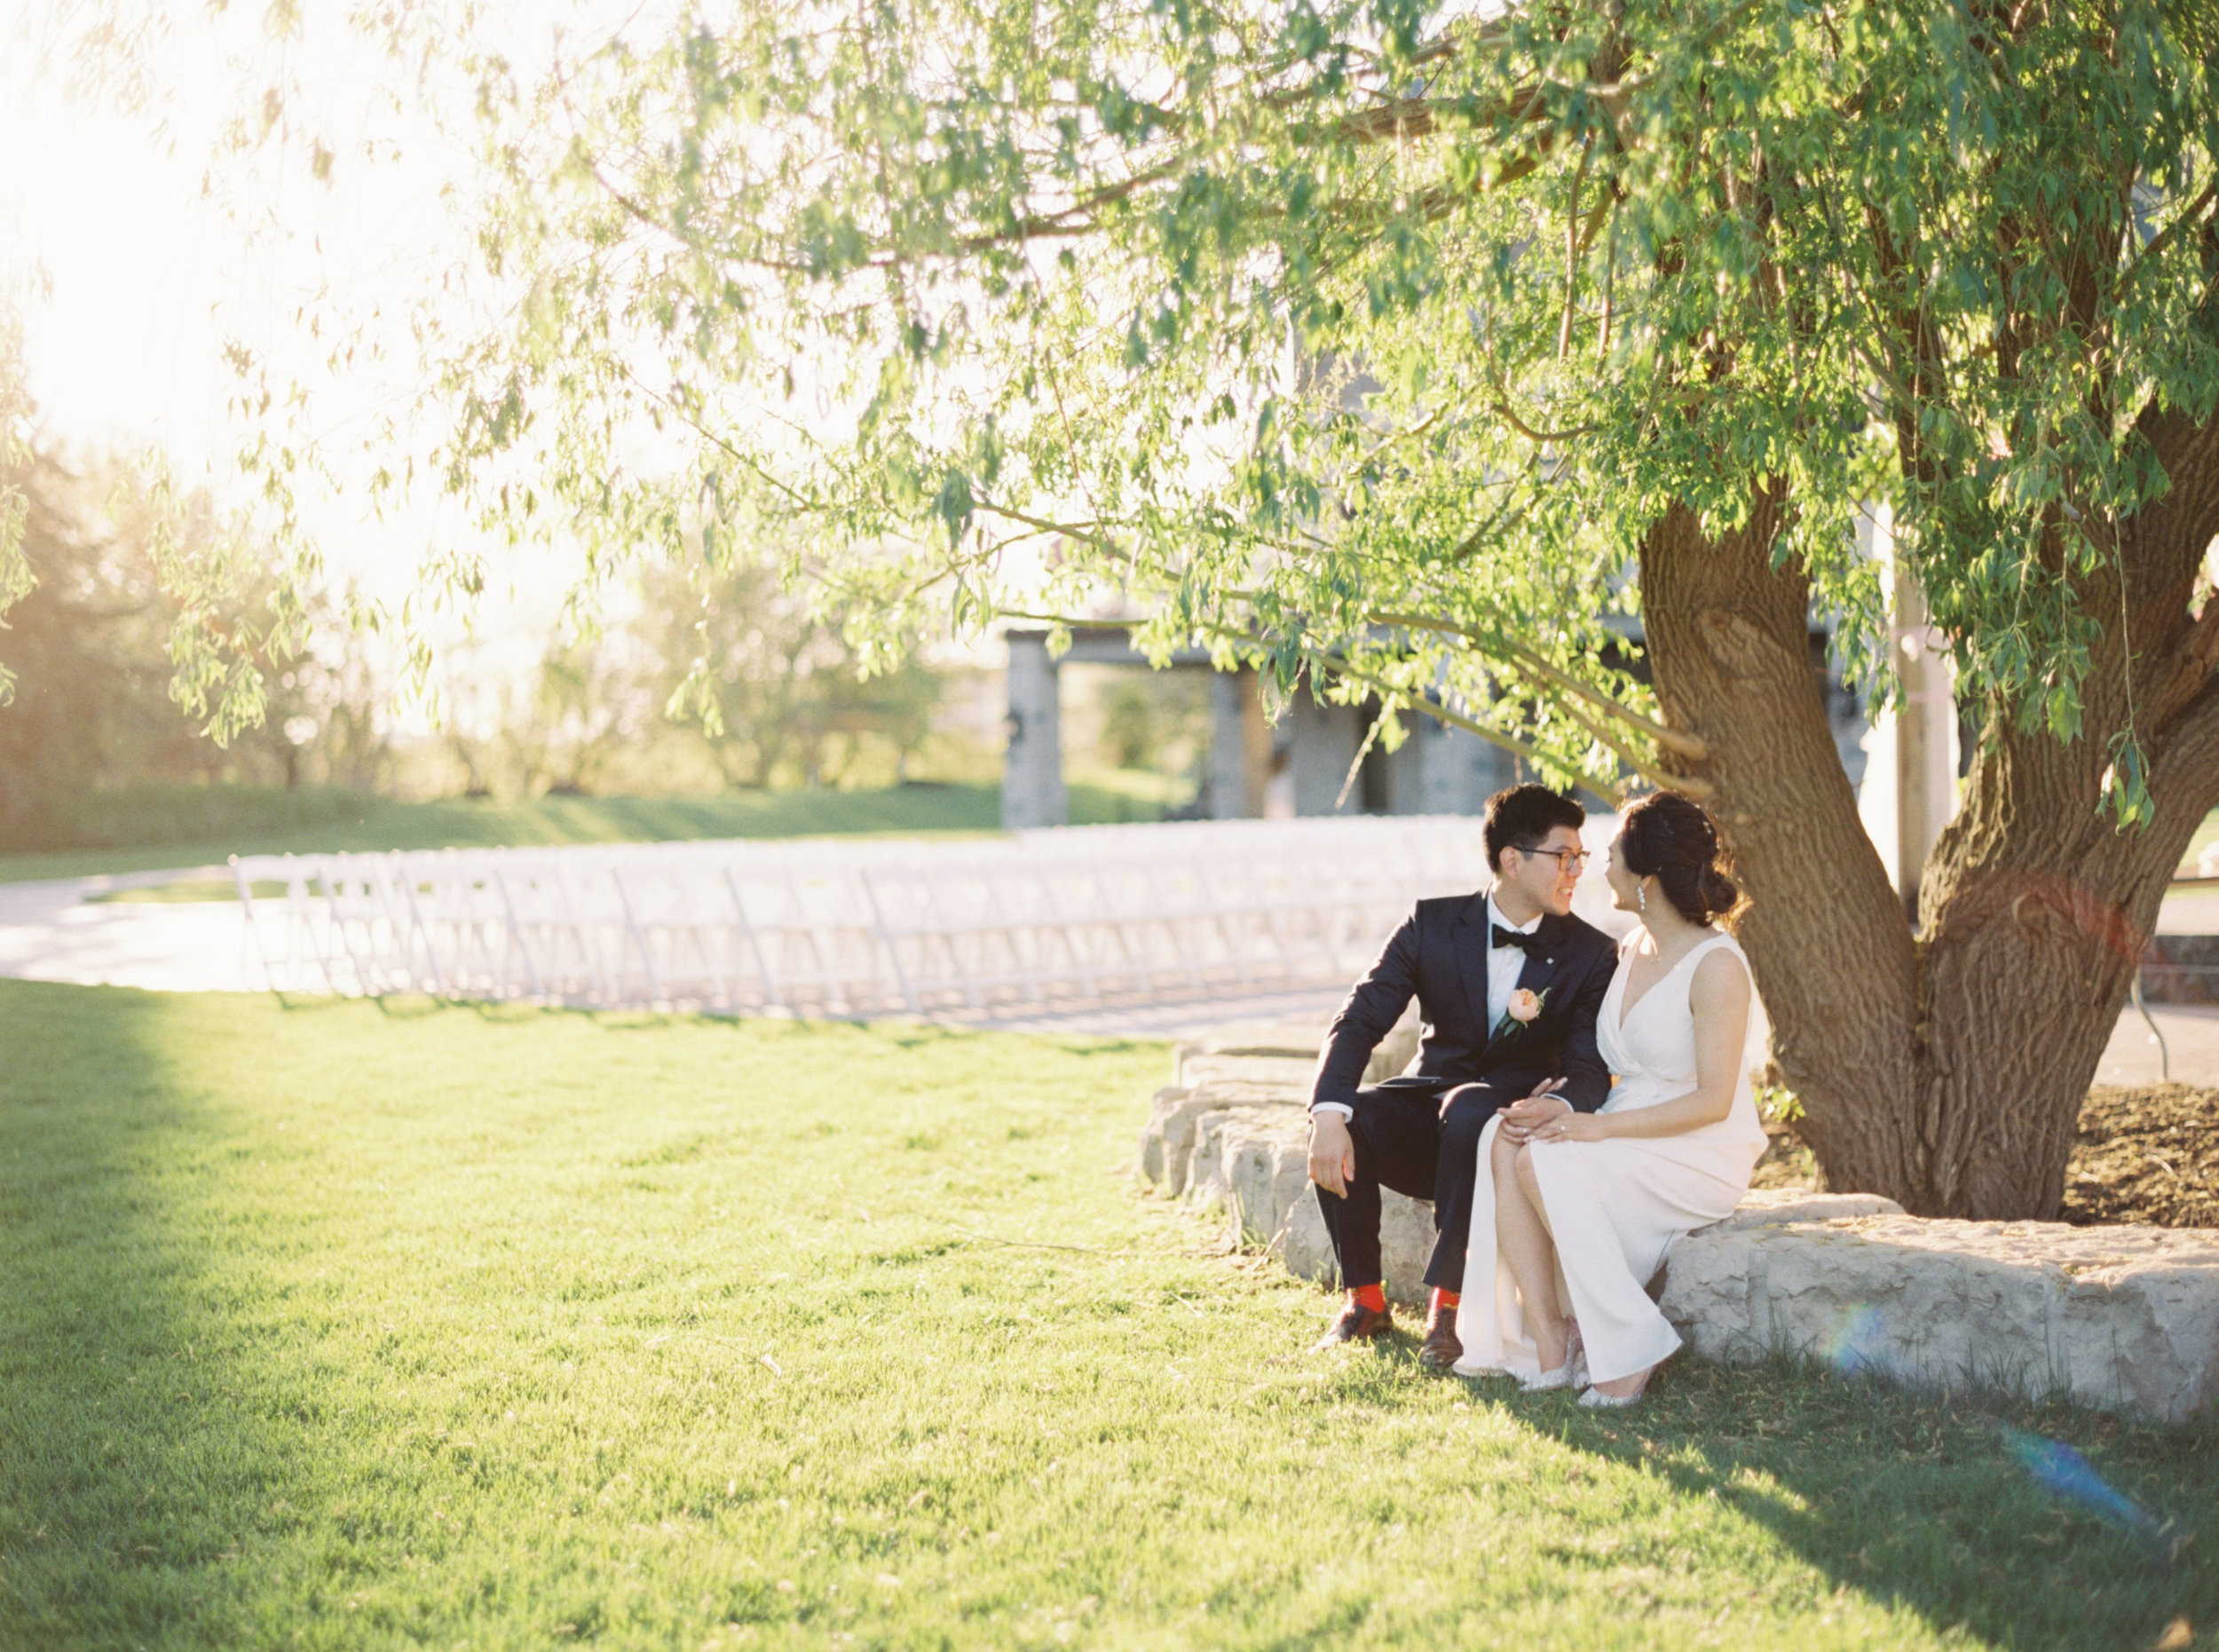 Arlington Estate Wedding - Sunset Photos-28.jpg